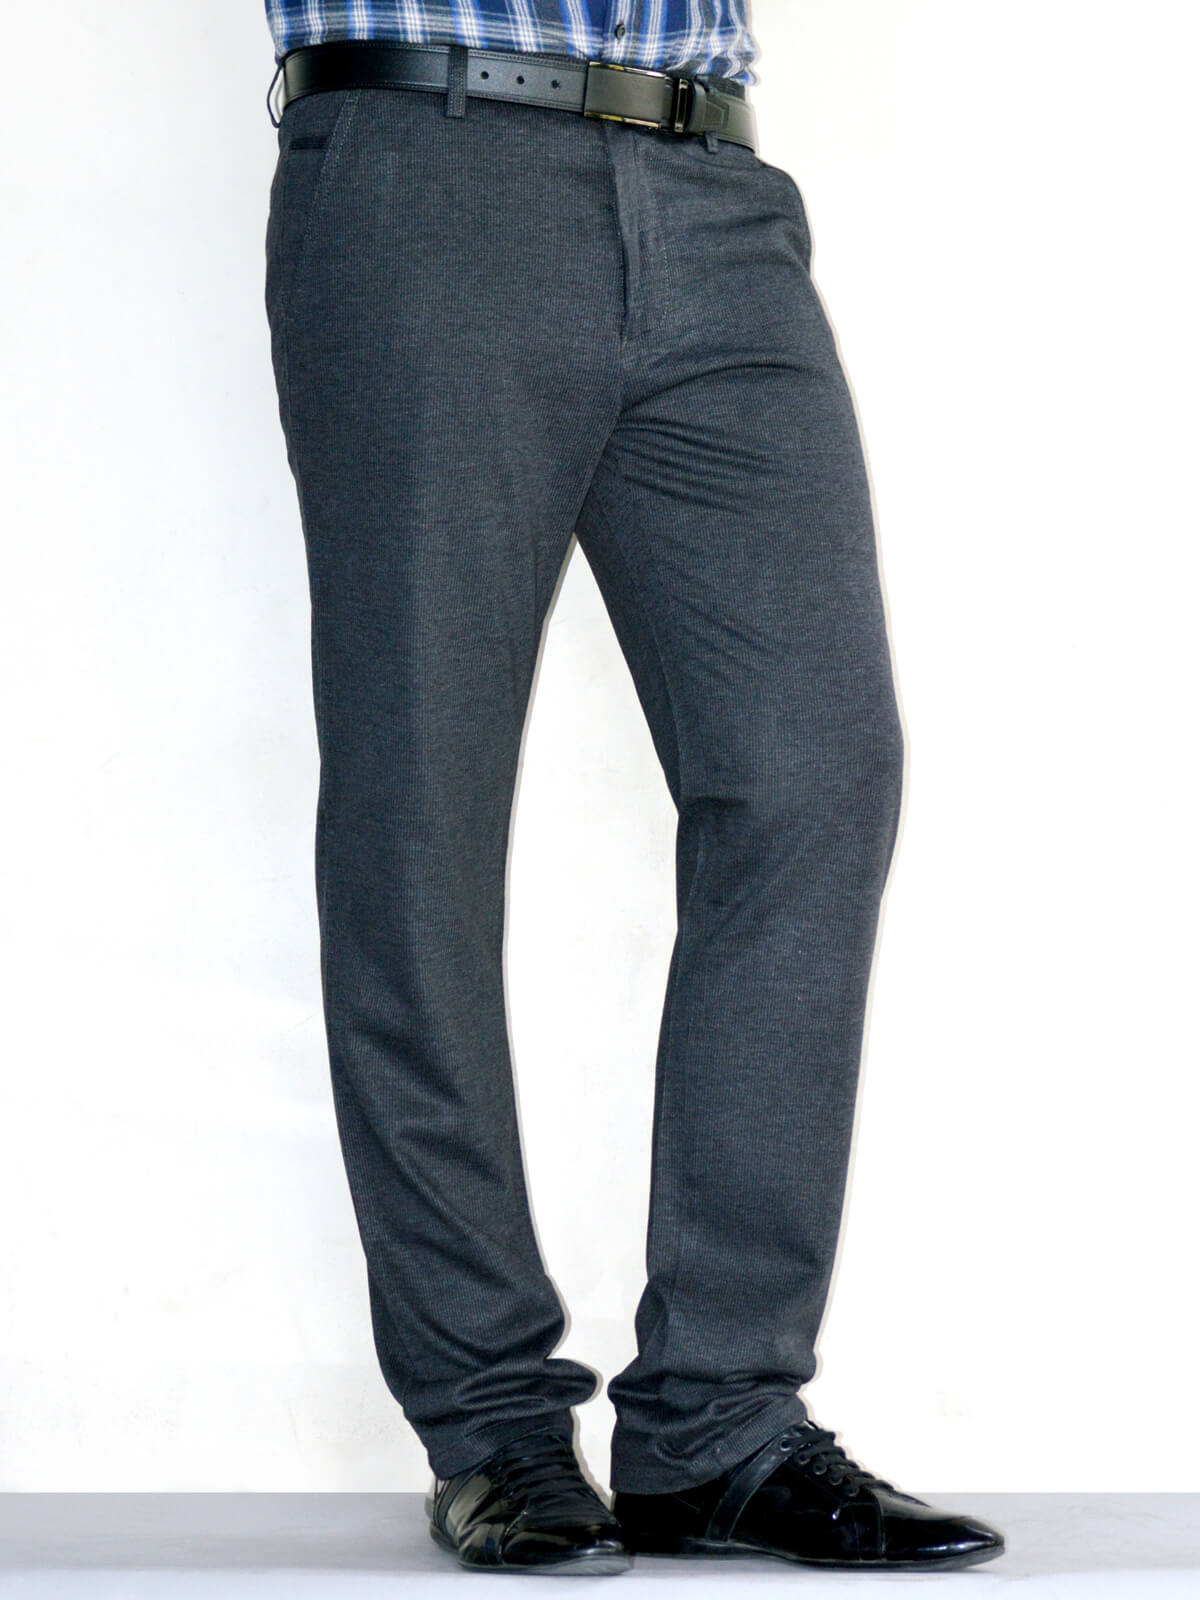 Eлегантен мъжки панталон